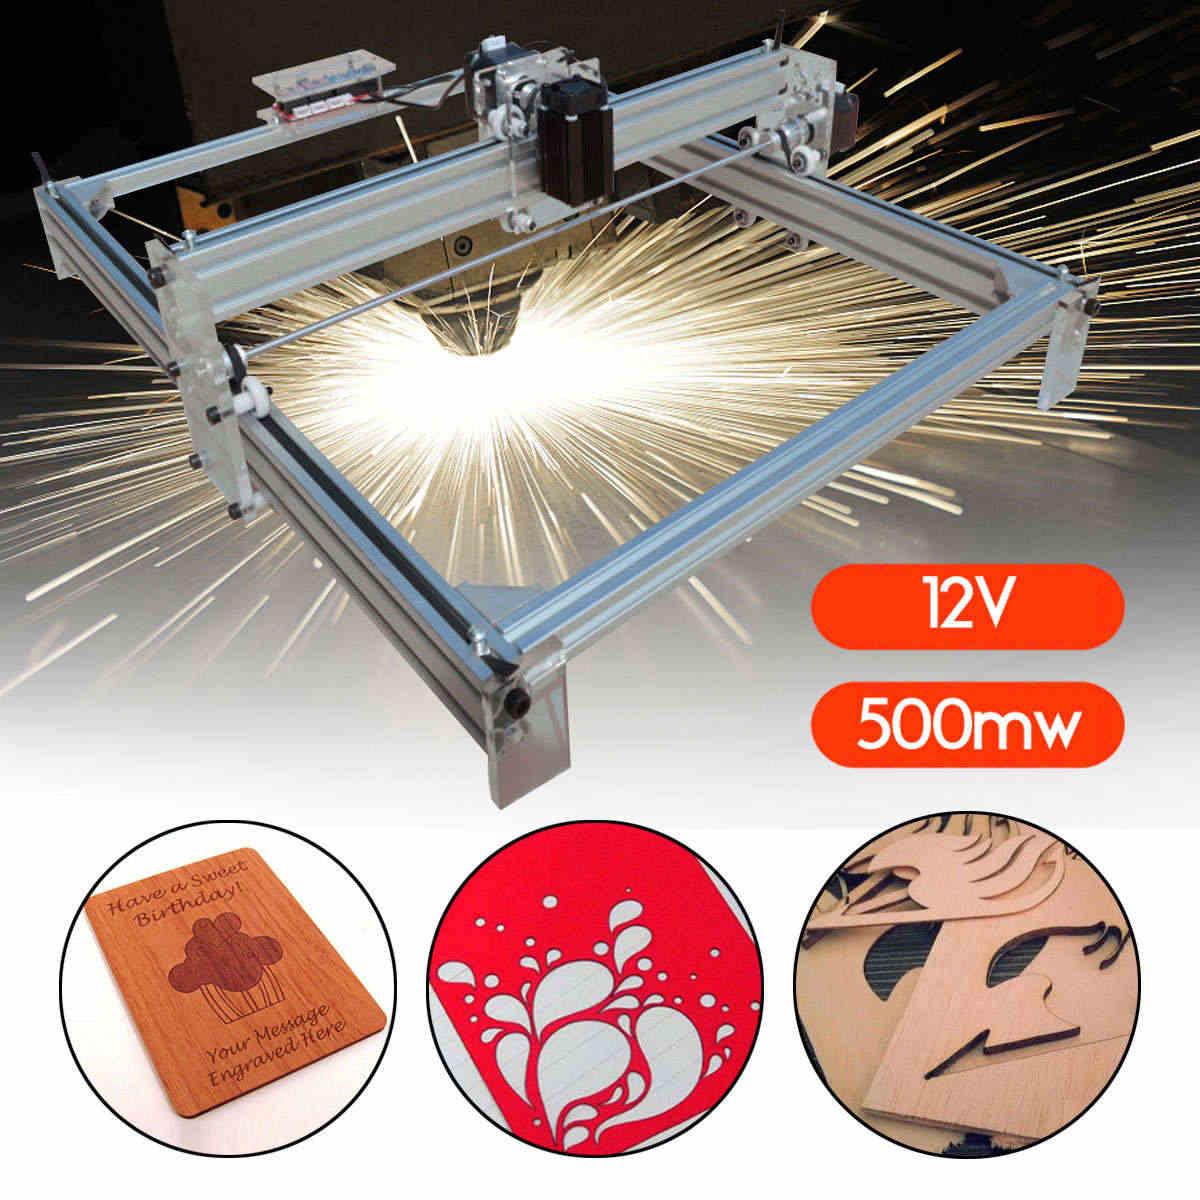 Mini máquina de grabado láser azul escritorio DIY 40X50 CM 500 mW enrutador de madera/cortador/impresora /potencia ajustable